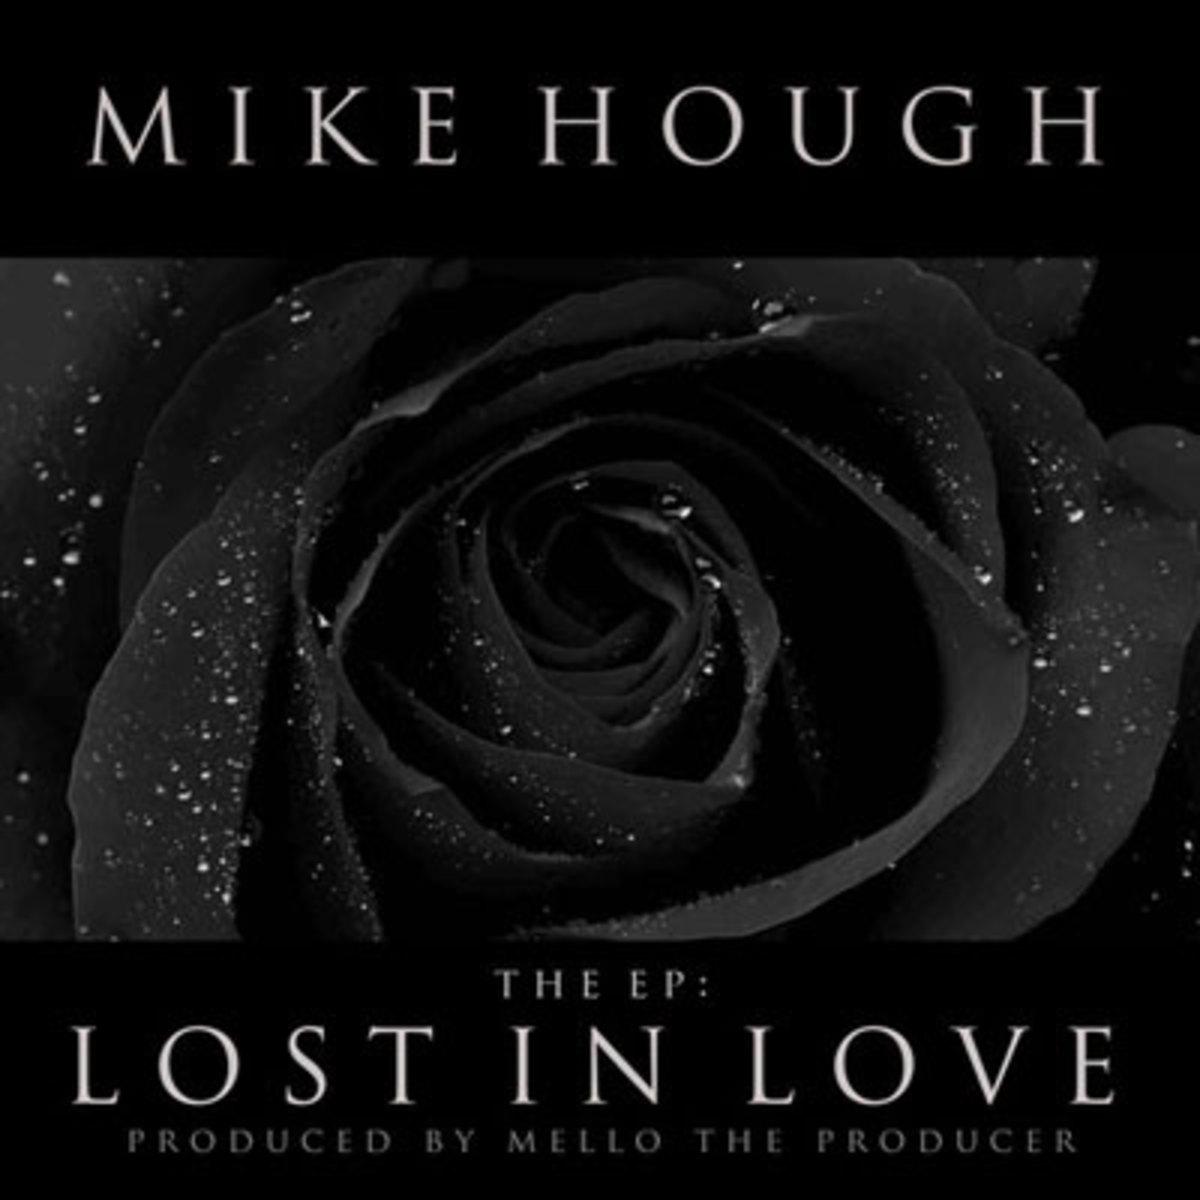 mikehough-lostinlove.jpg